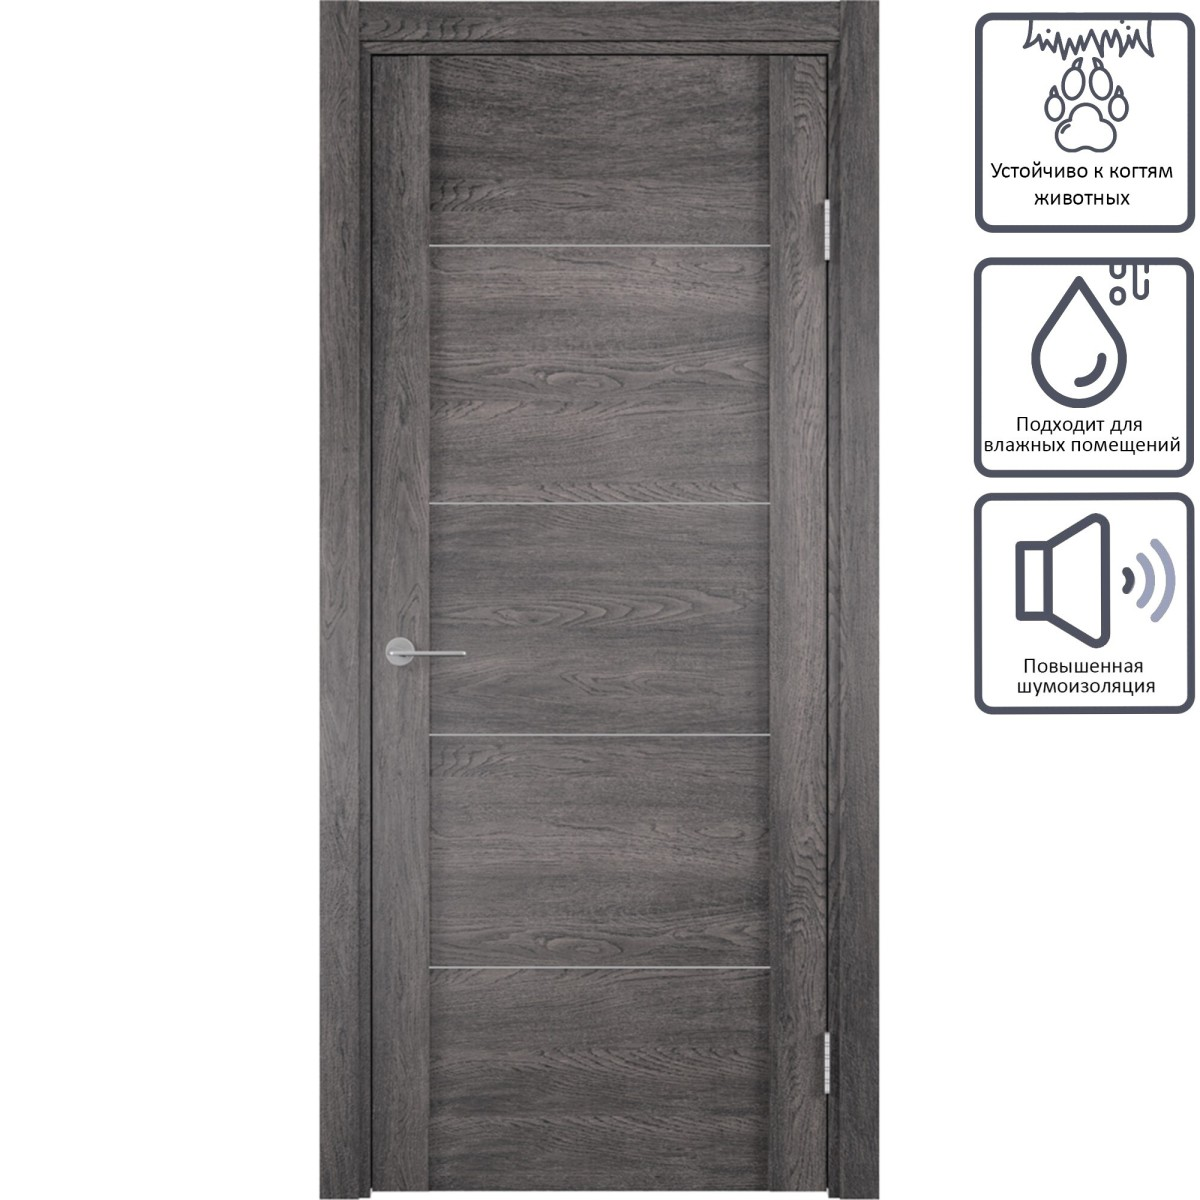 Дверь Межкомнатная Глухая С Замком В Комплекте Квадро 200x80 Пвх Цвет Шале Серый